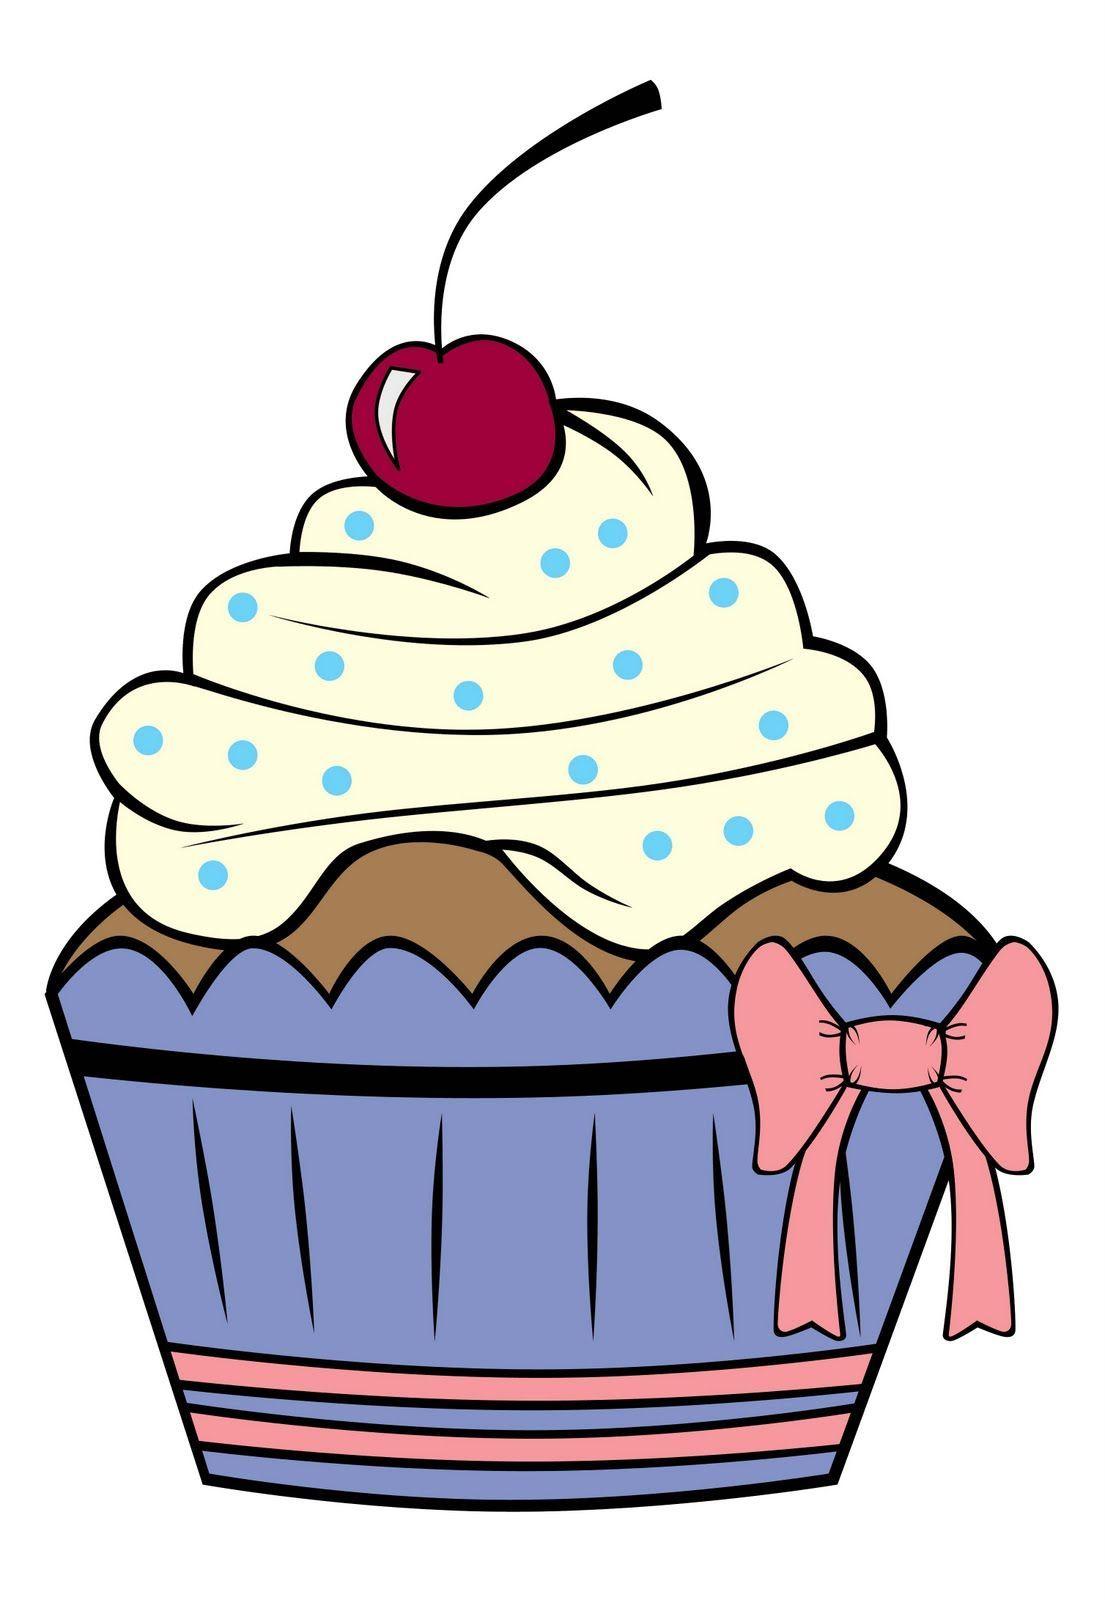 1105x1600 Inspiring Cupcake Outline Clip Art Cartoon Cake Pic Of Coloring